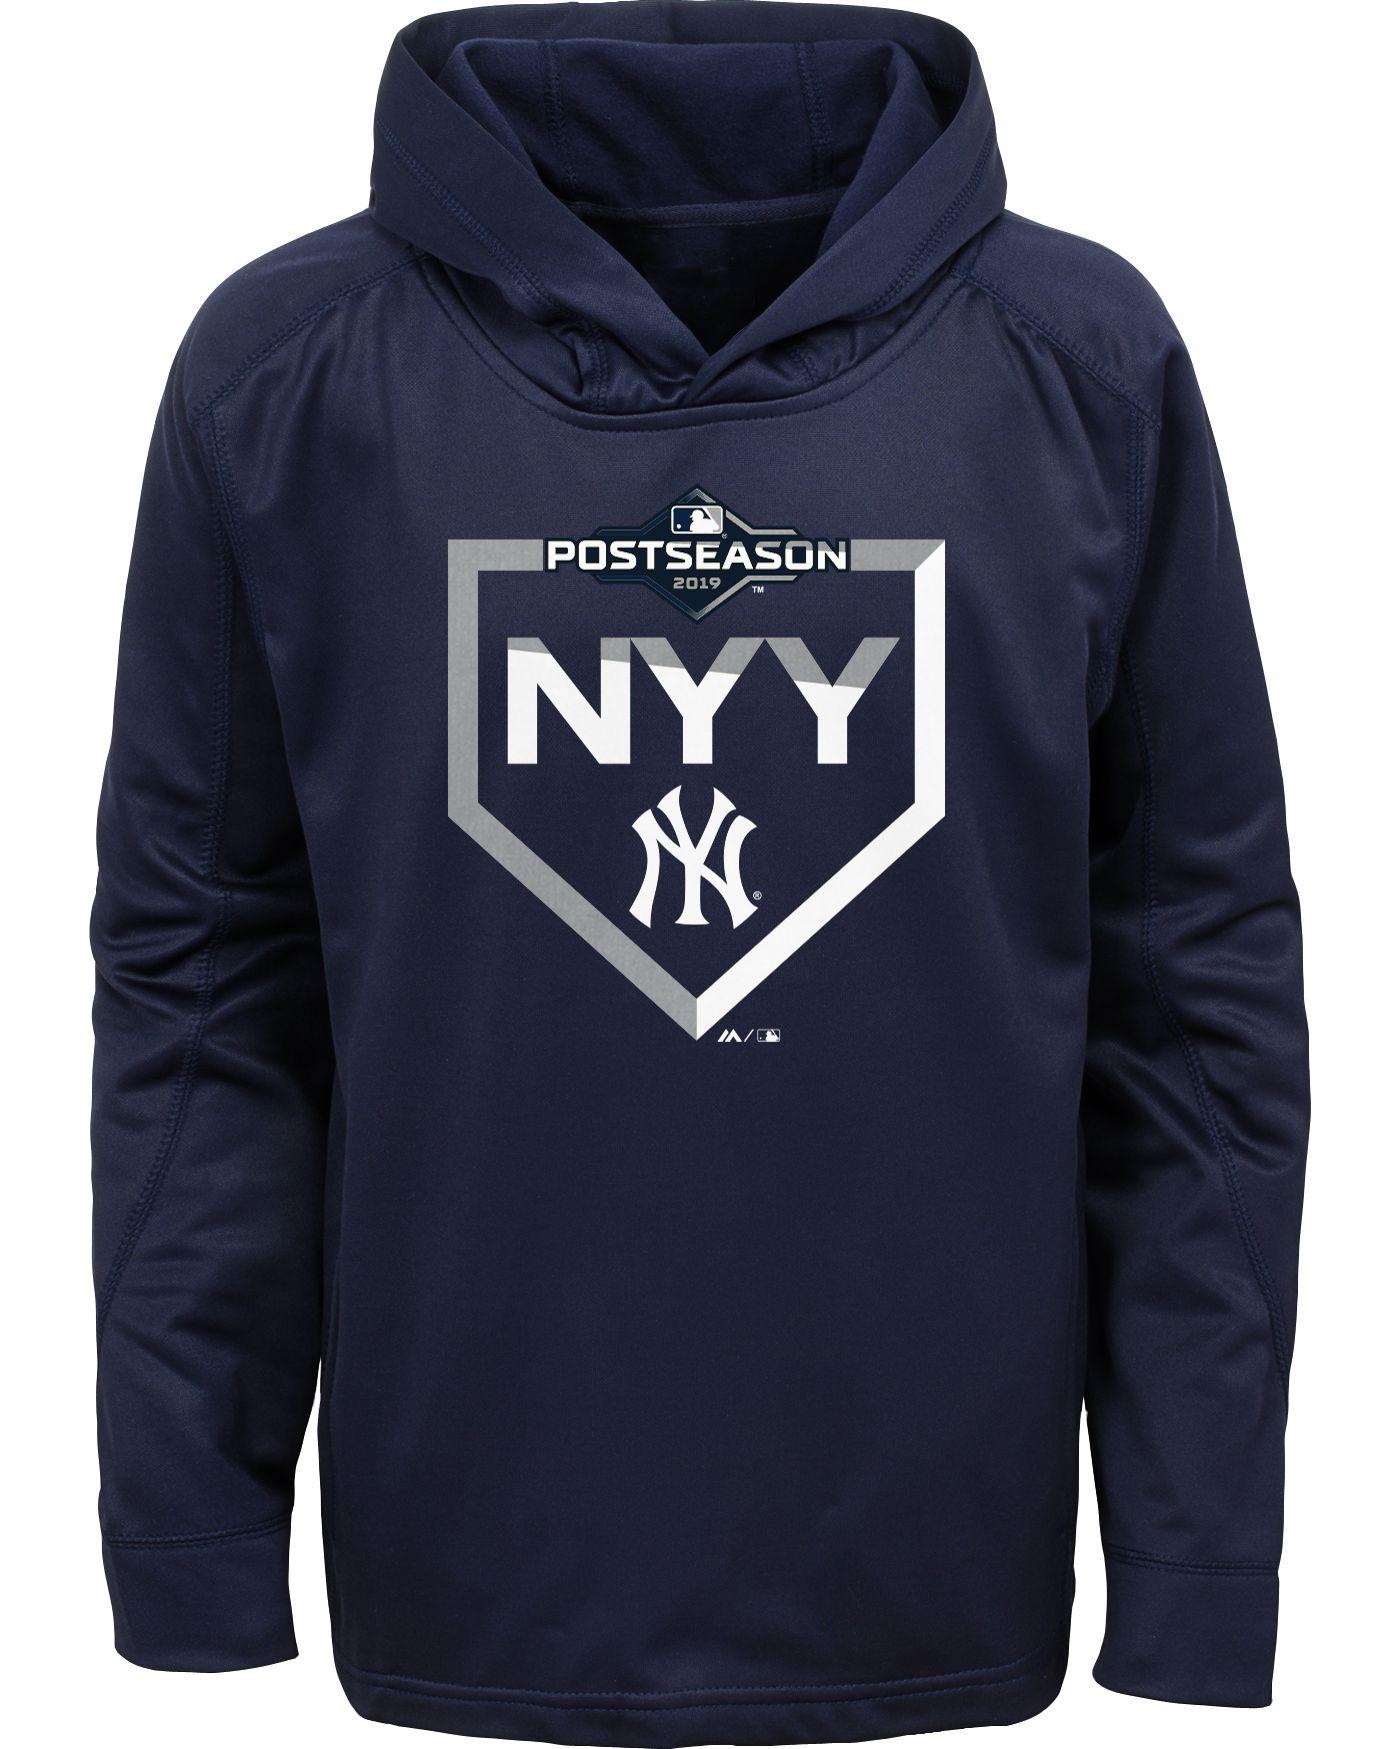 Majestic Youth New York Yankees 2019 MLB Postseason On-Field Therma Base Hoodie